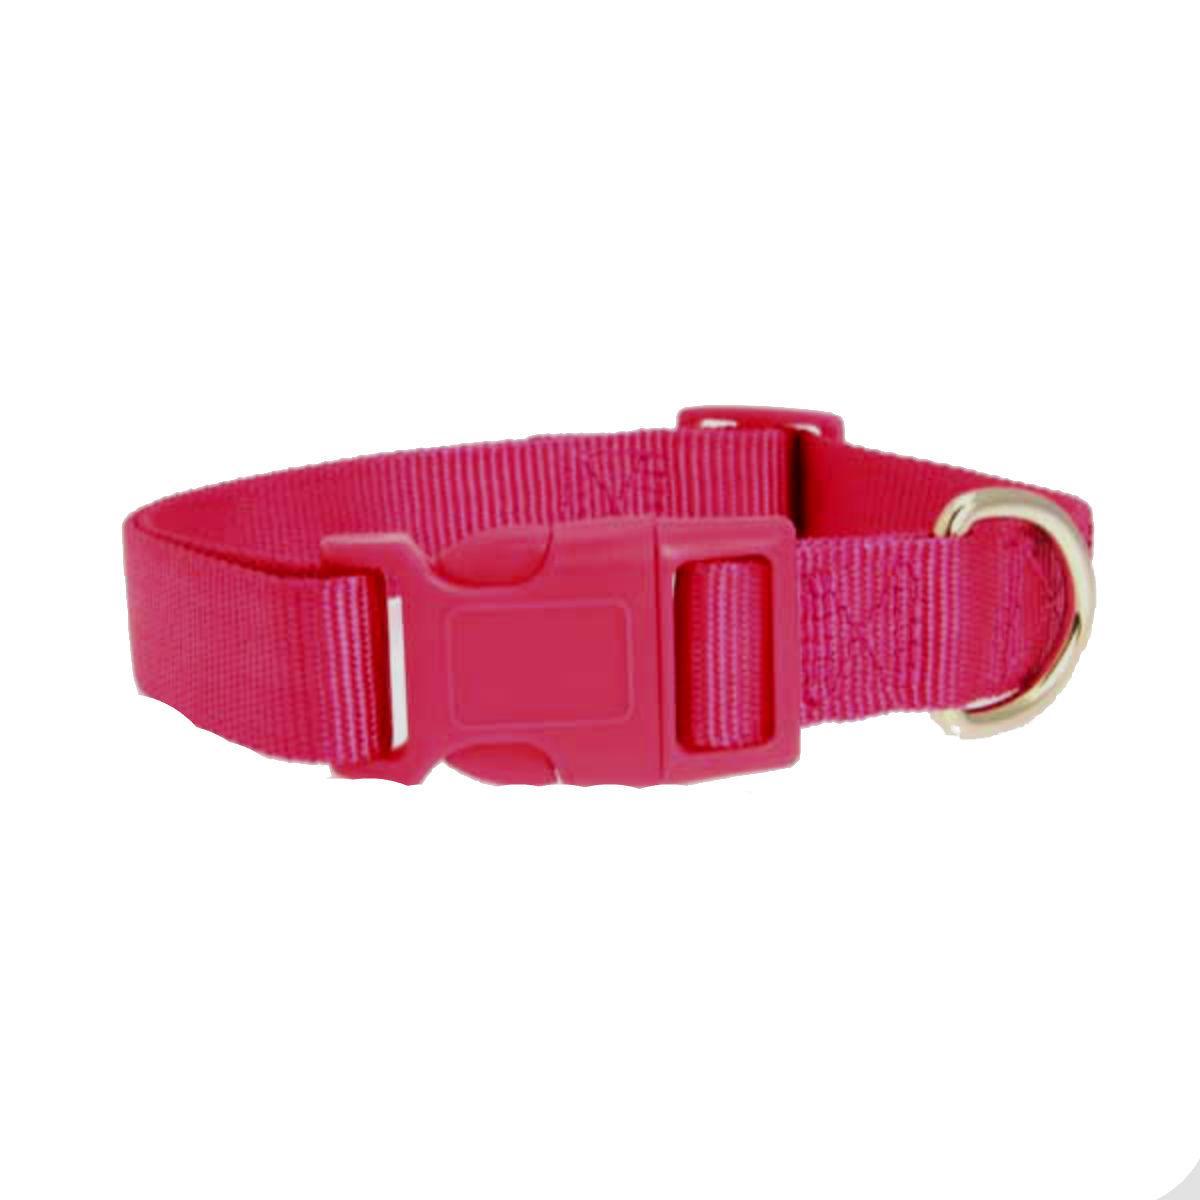 Casual Canine Nylon Dog Collar - Raspberry Pink